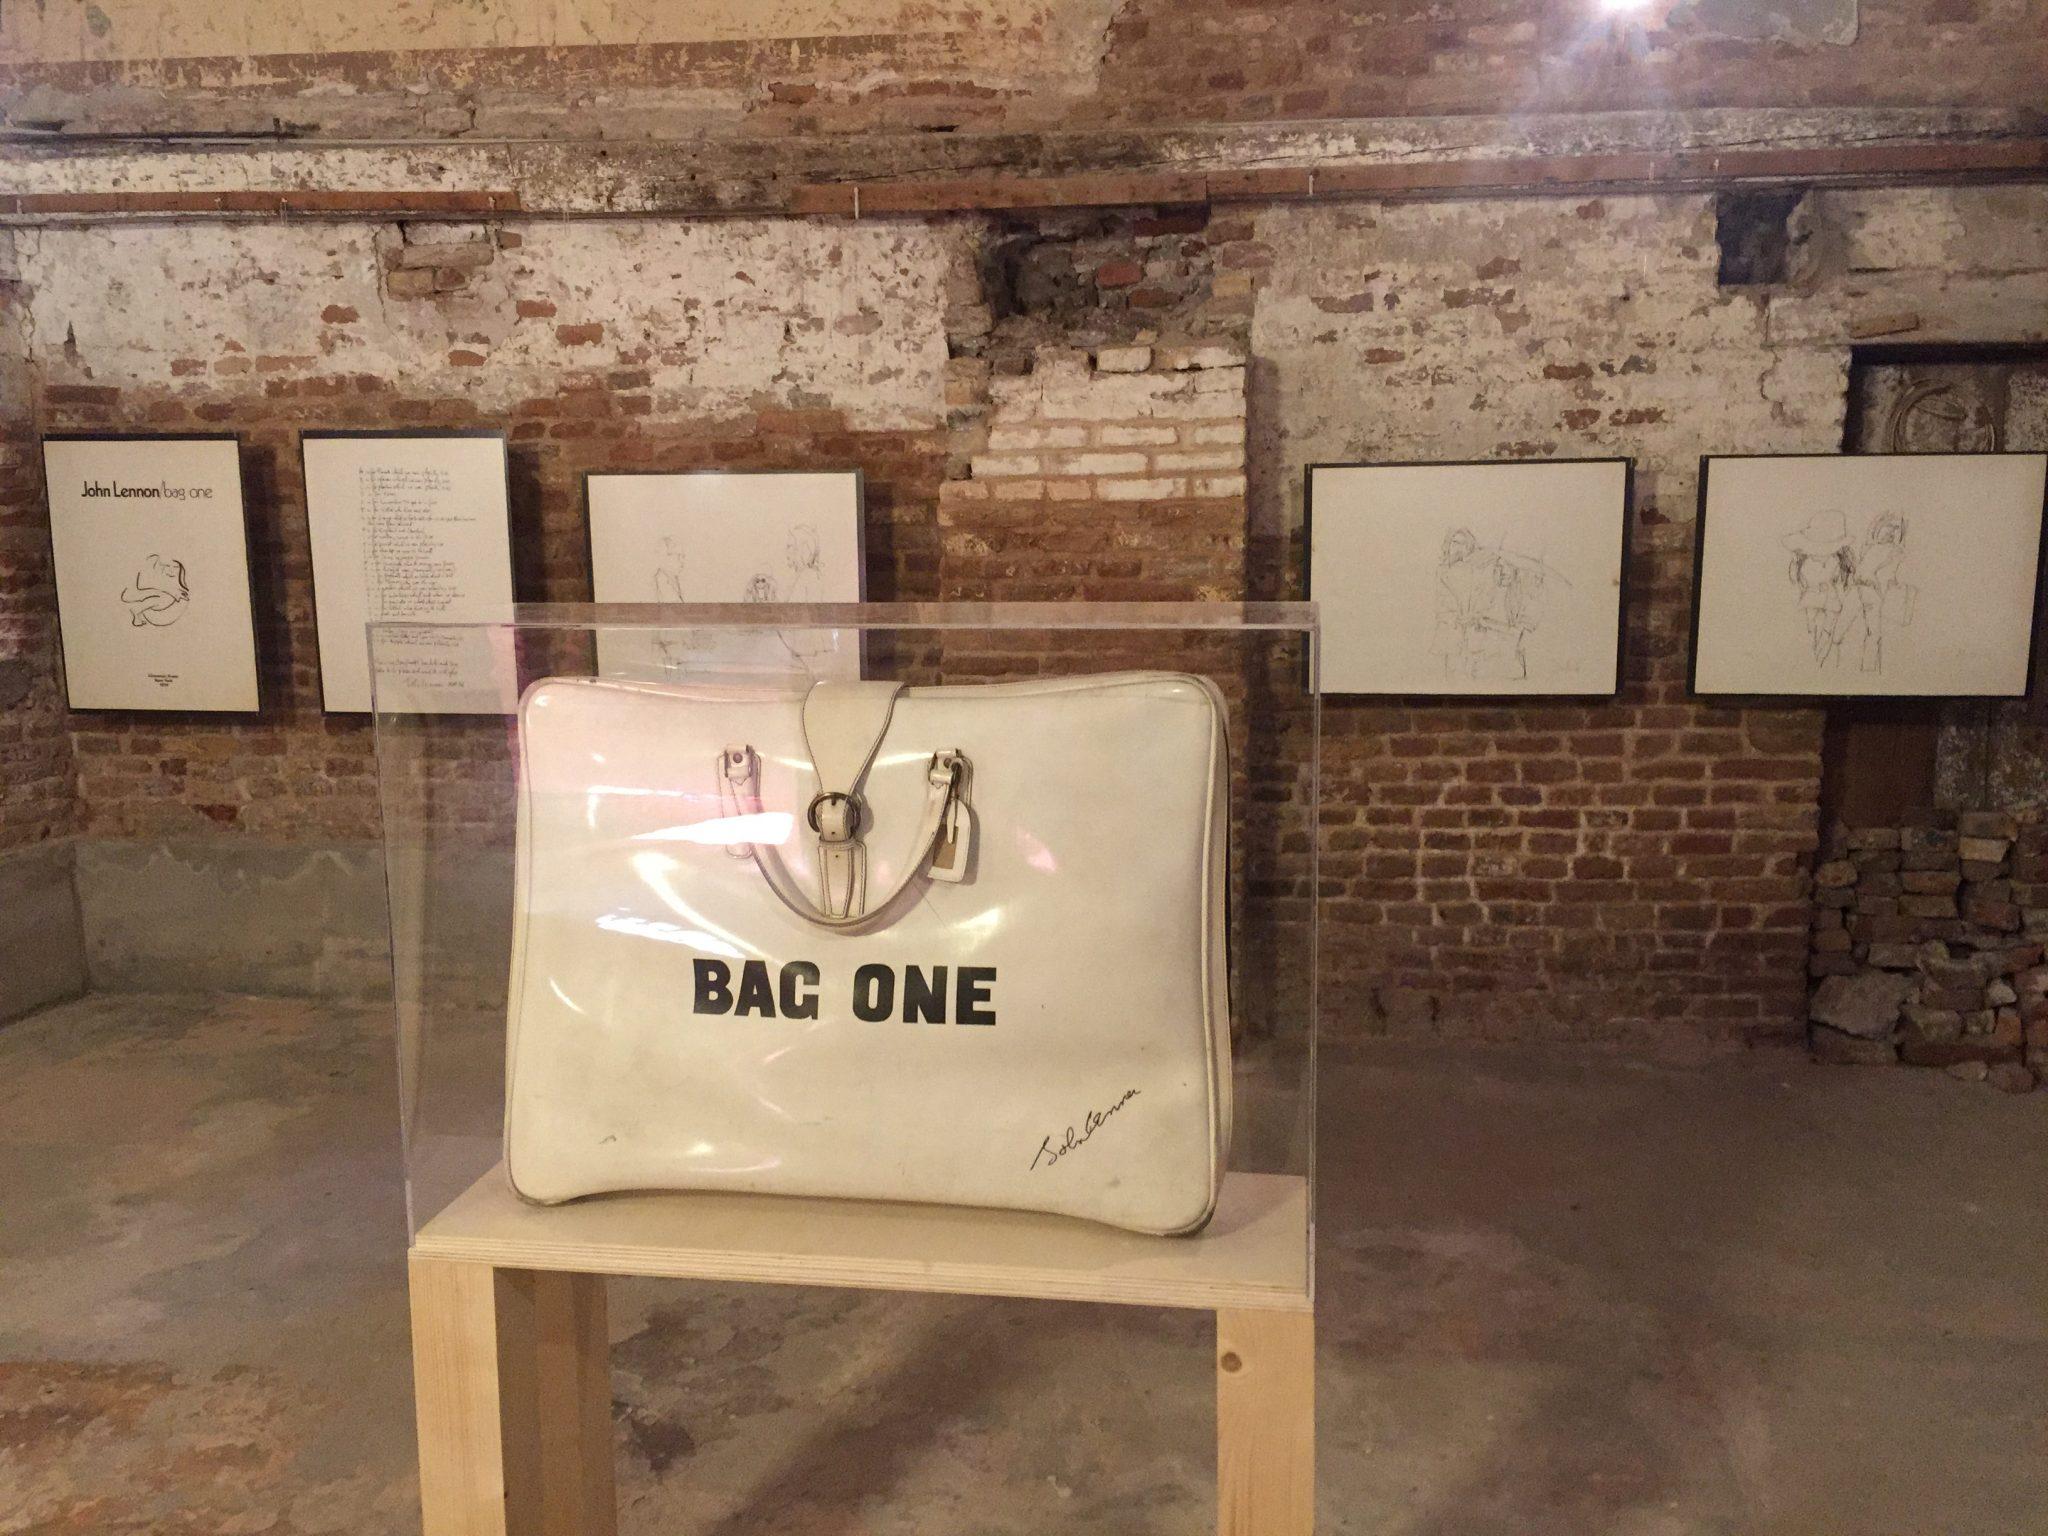 WATER/MATER; Bag One; John Lennon; Yoko Ono